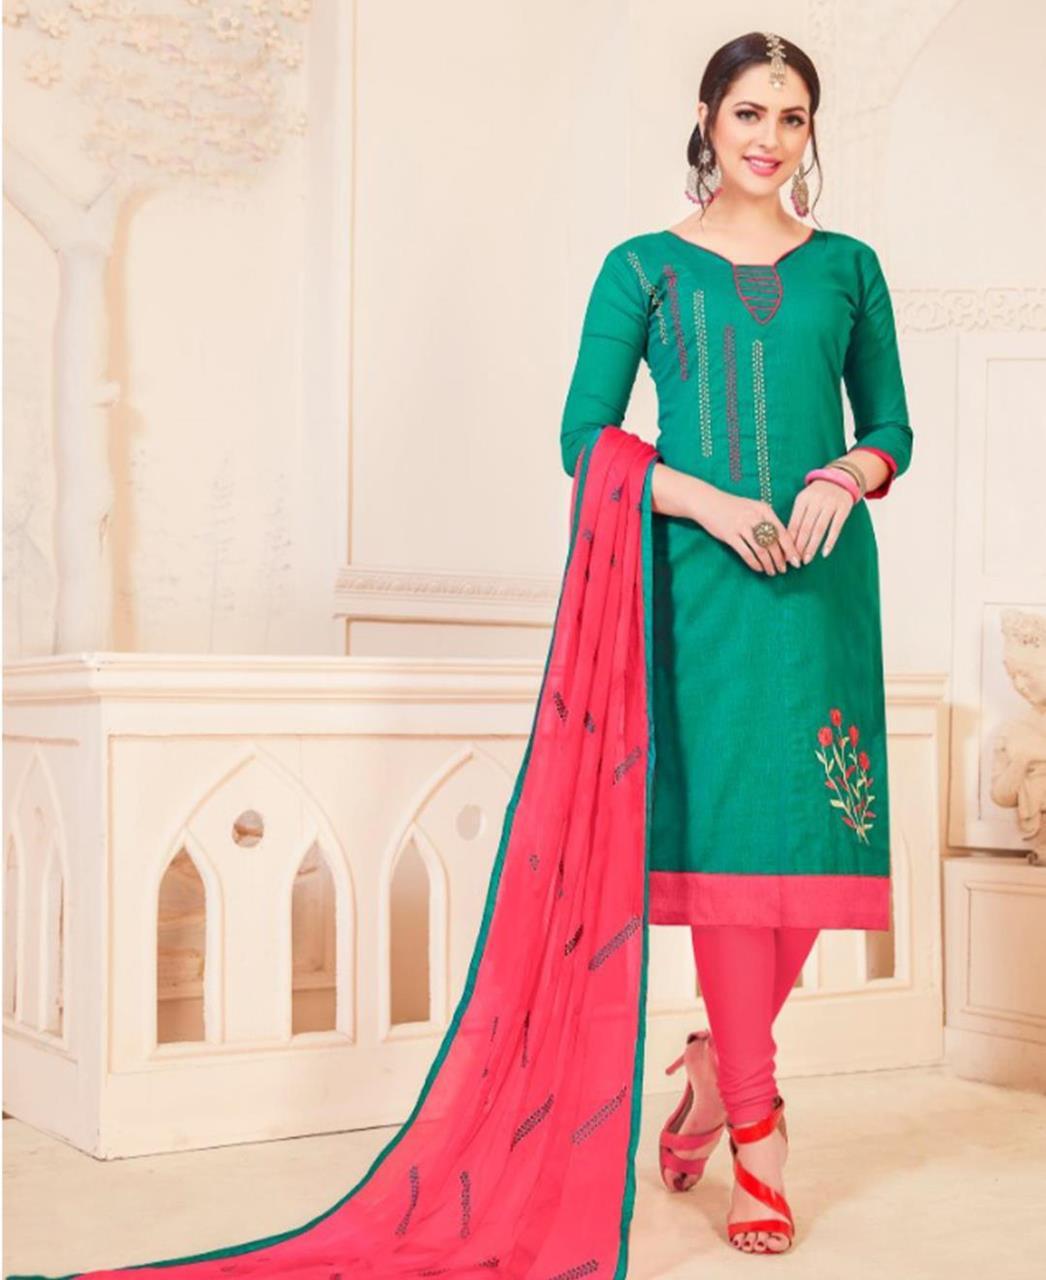 Embroidered Cotton Green Straight Cut Salwar Kameez